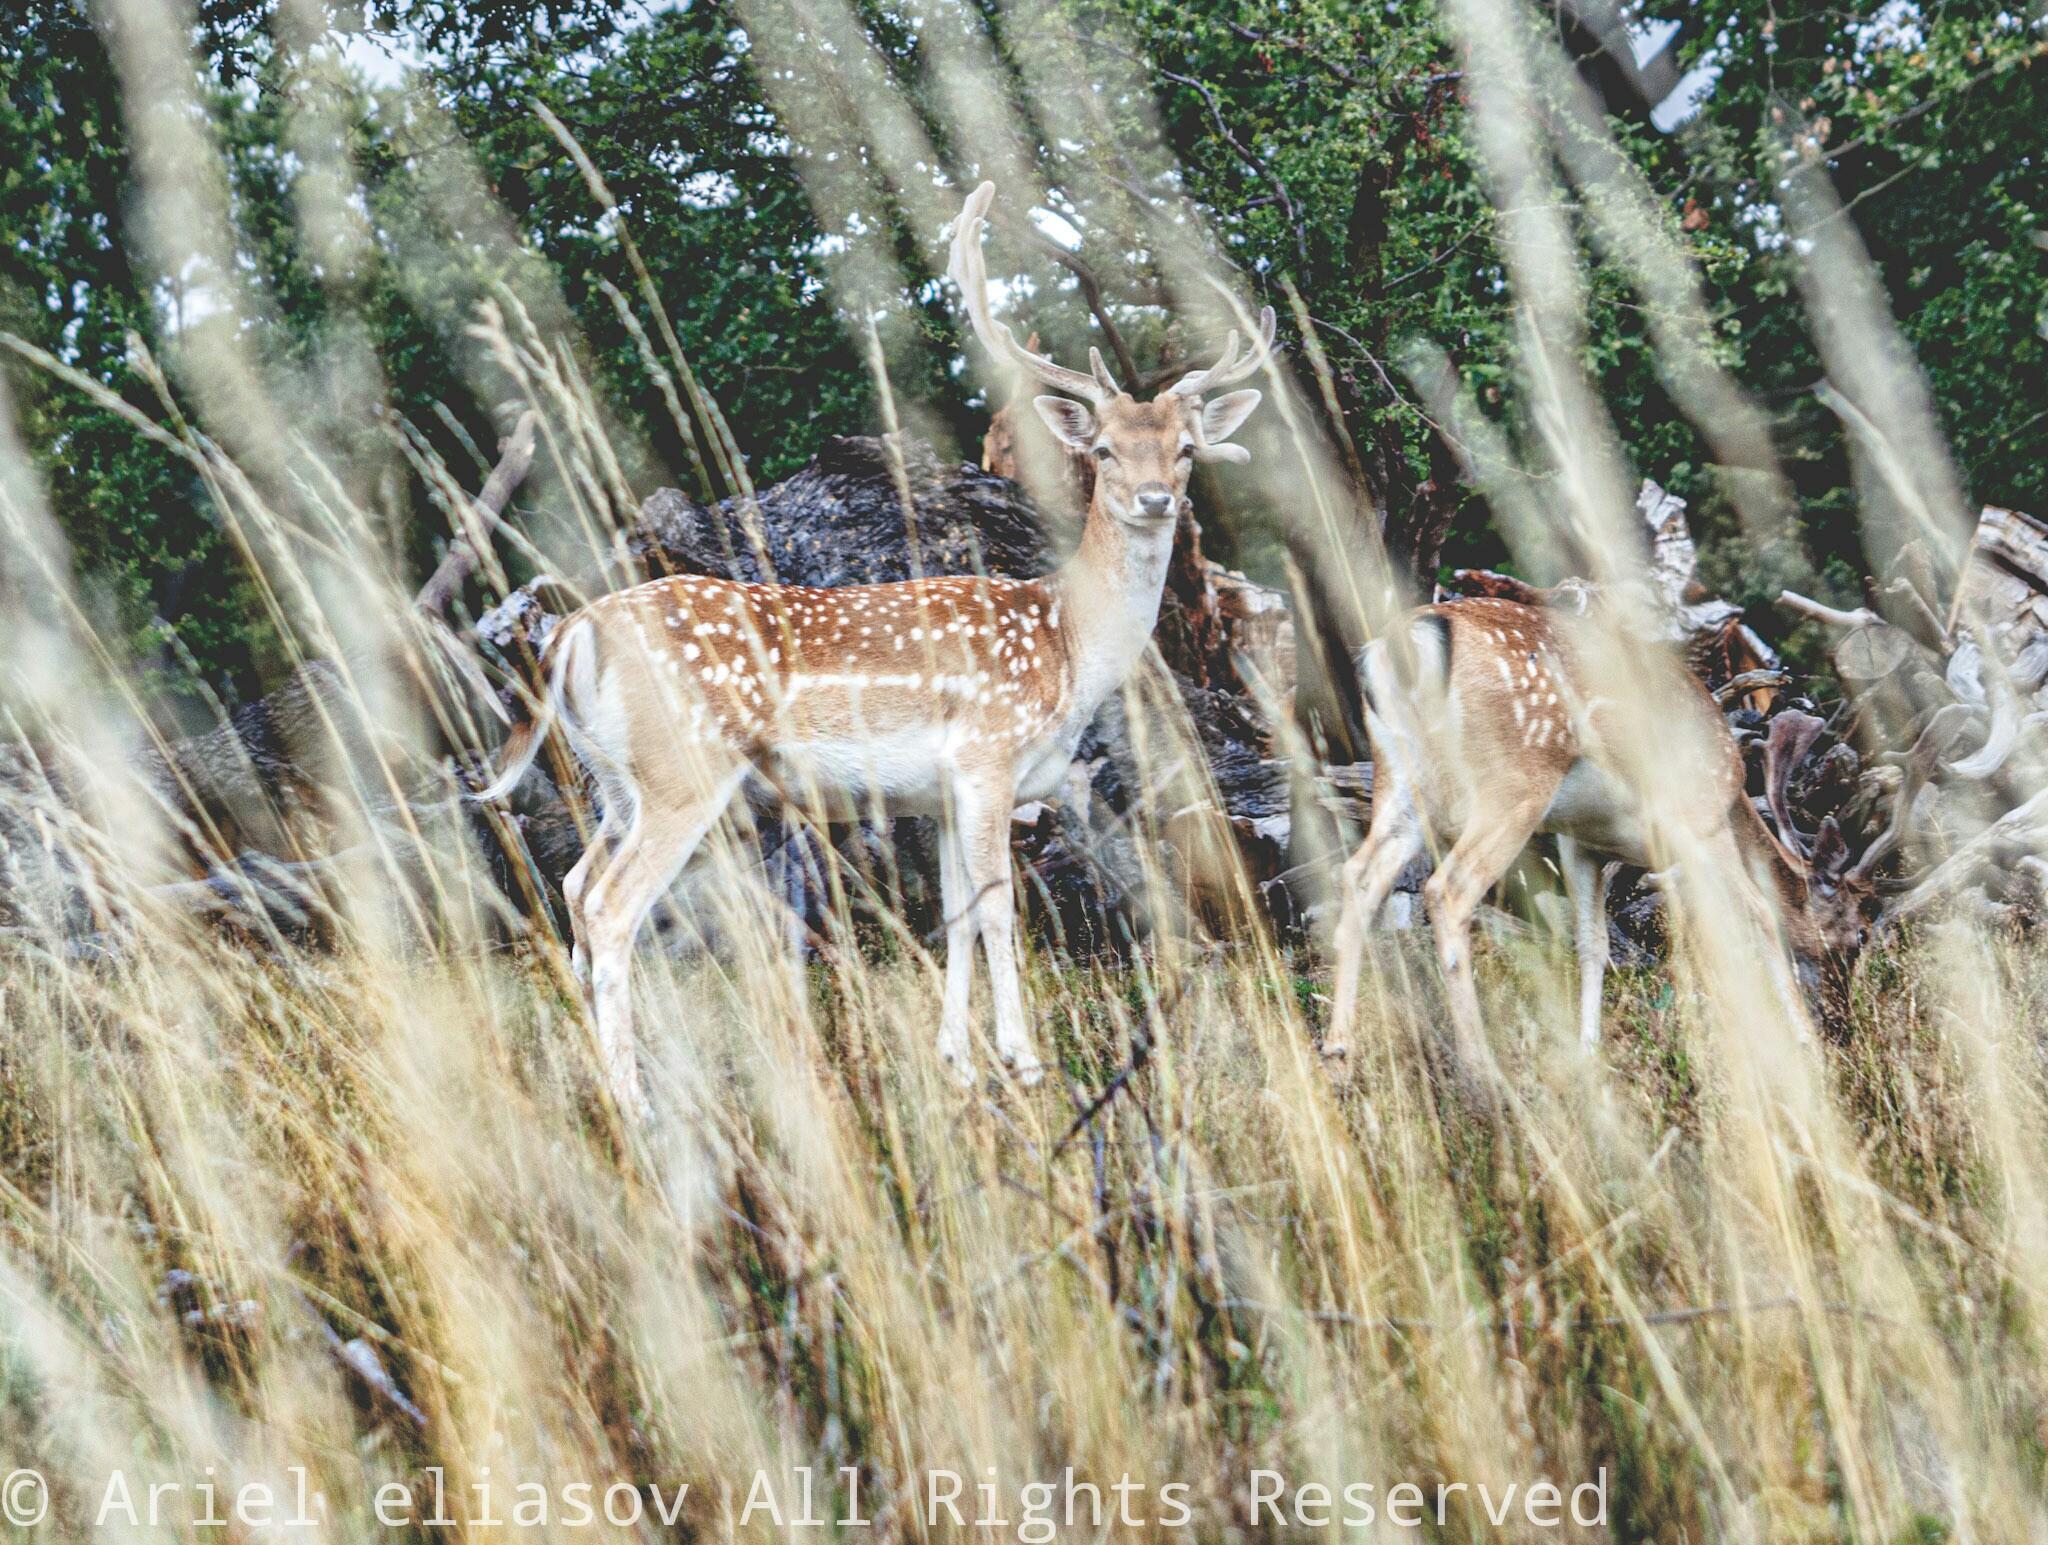 Richmond park deer, United Kingdom